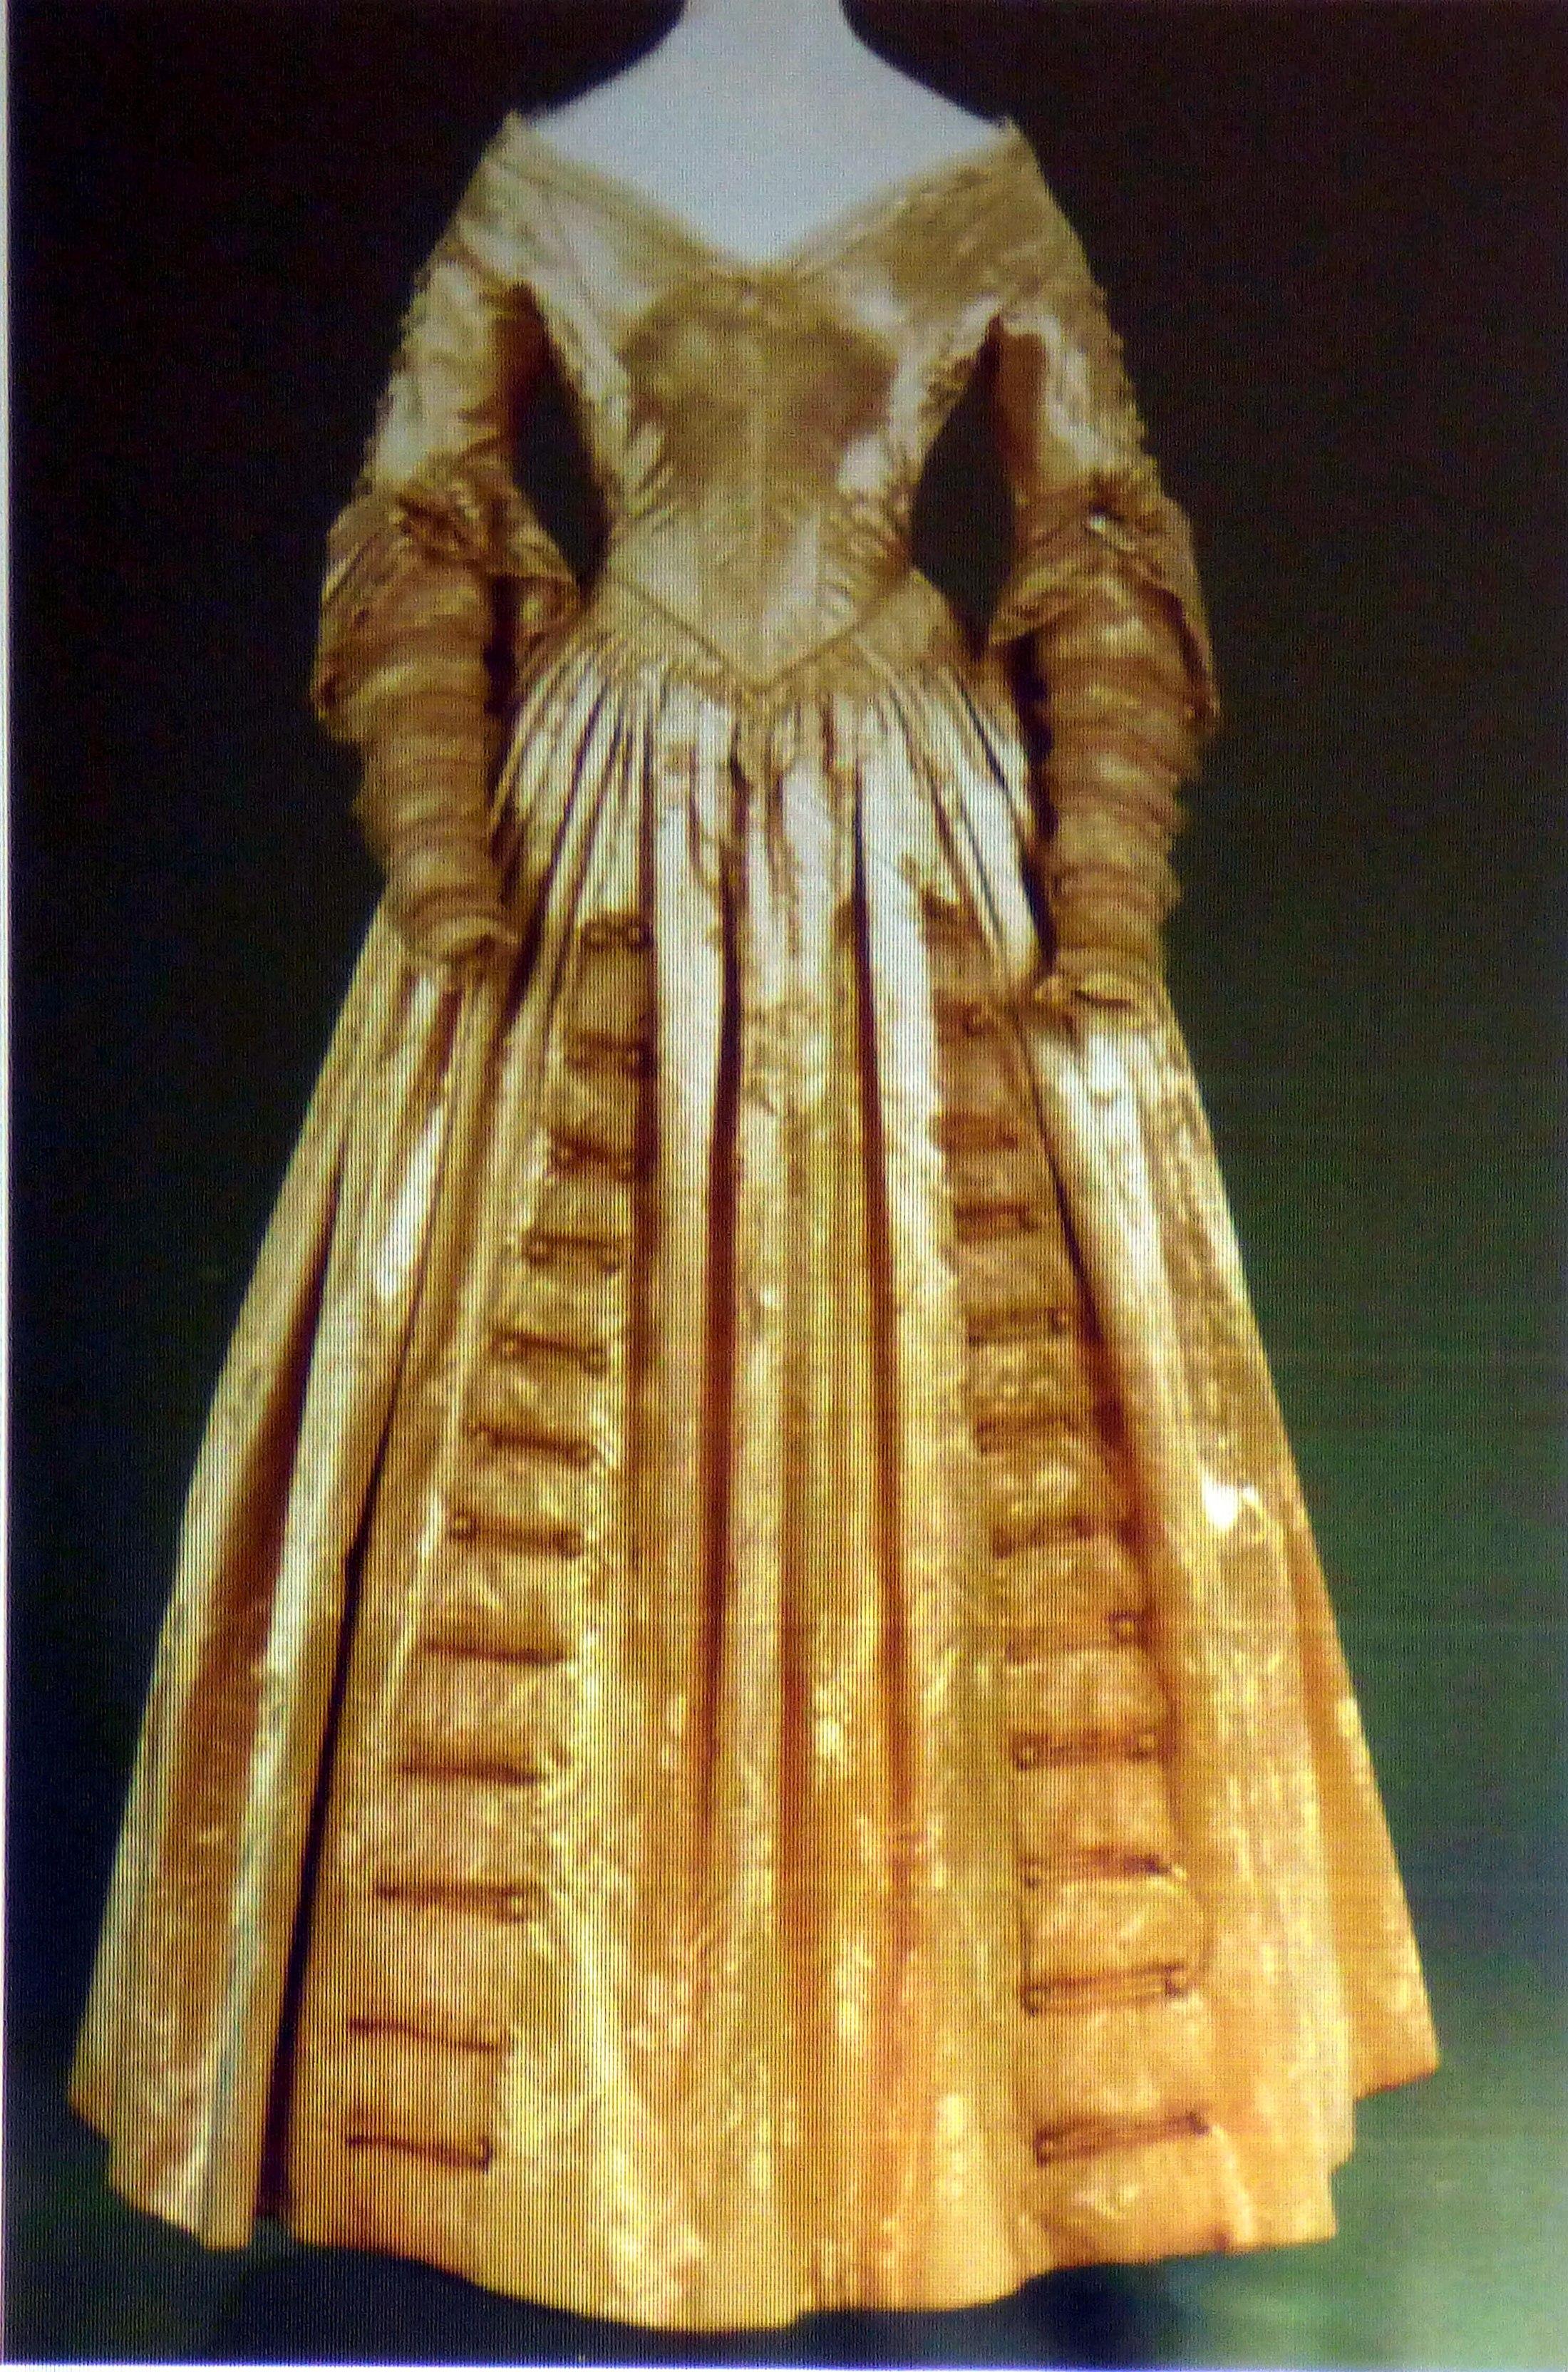 slide showing figured silk-satin dress 1841, History of the Wedding Dress talk by Gill Roberts, MEG 2018